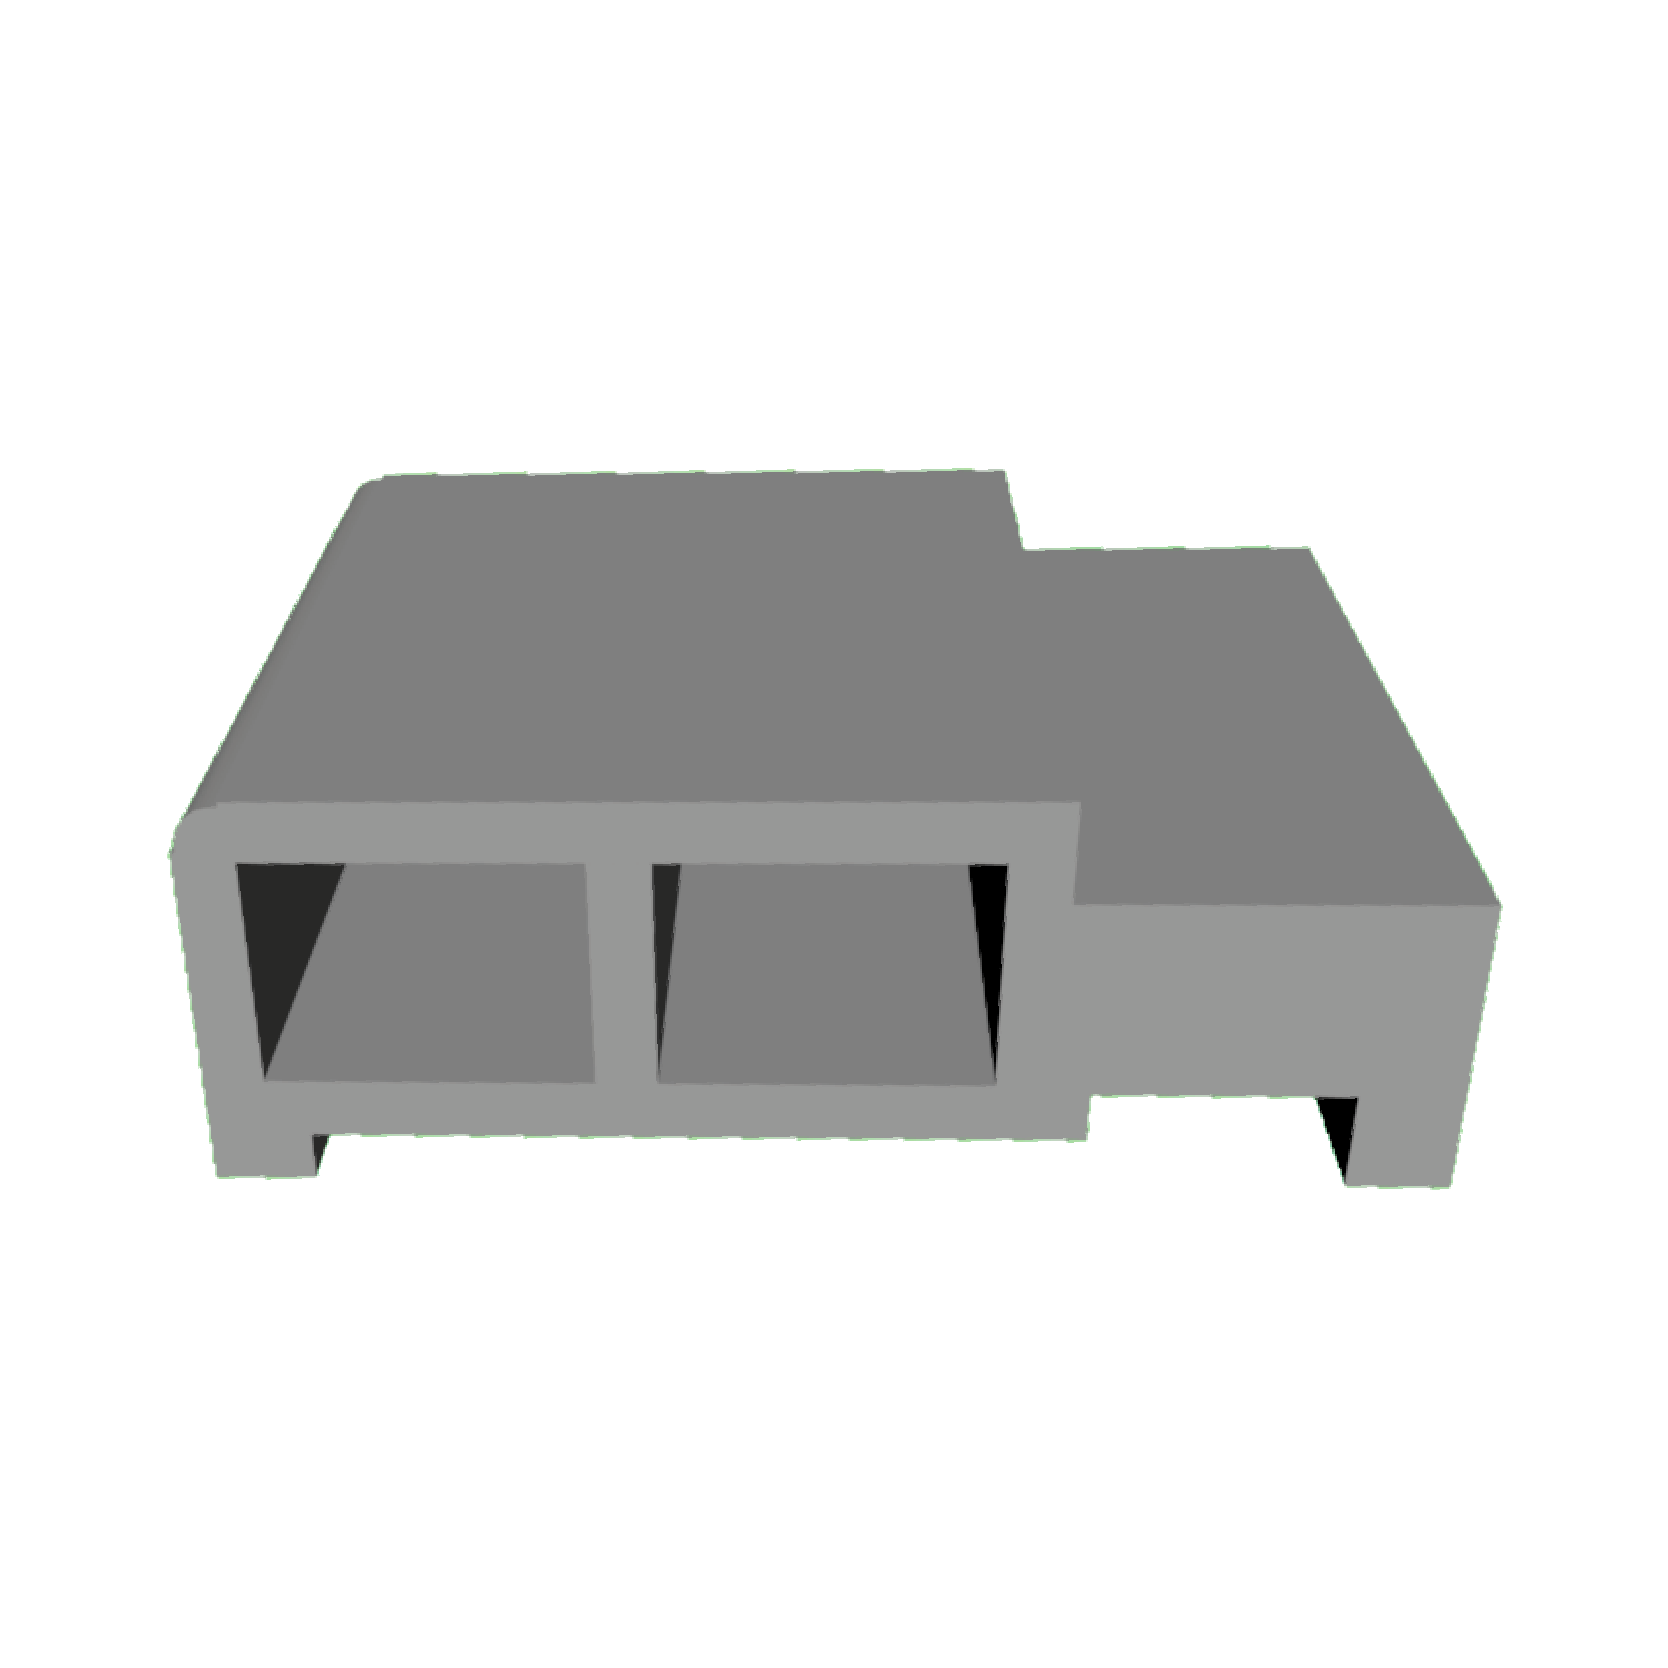 frame-wpc-bathic-fw2-grey-1